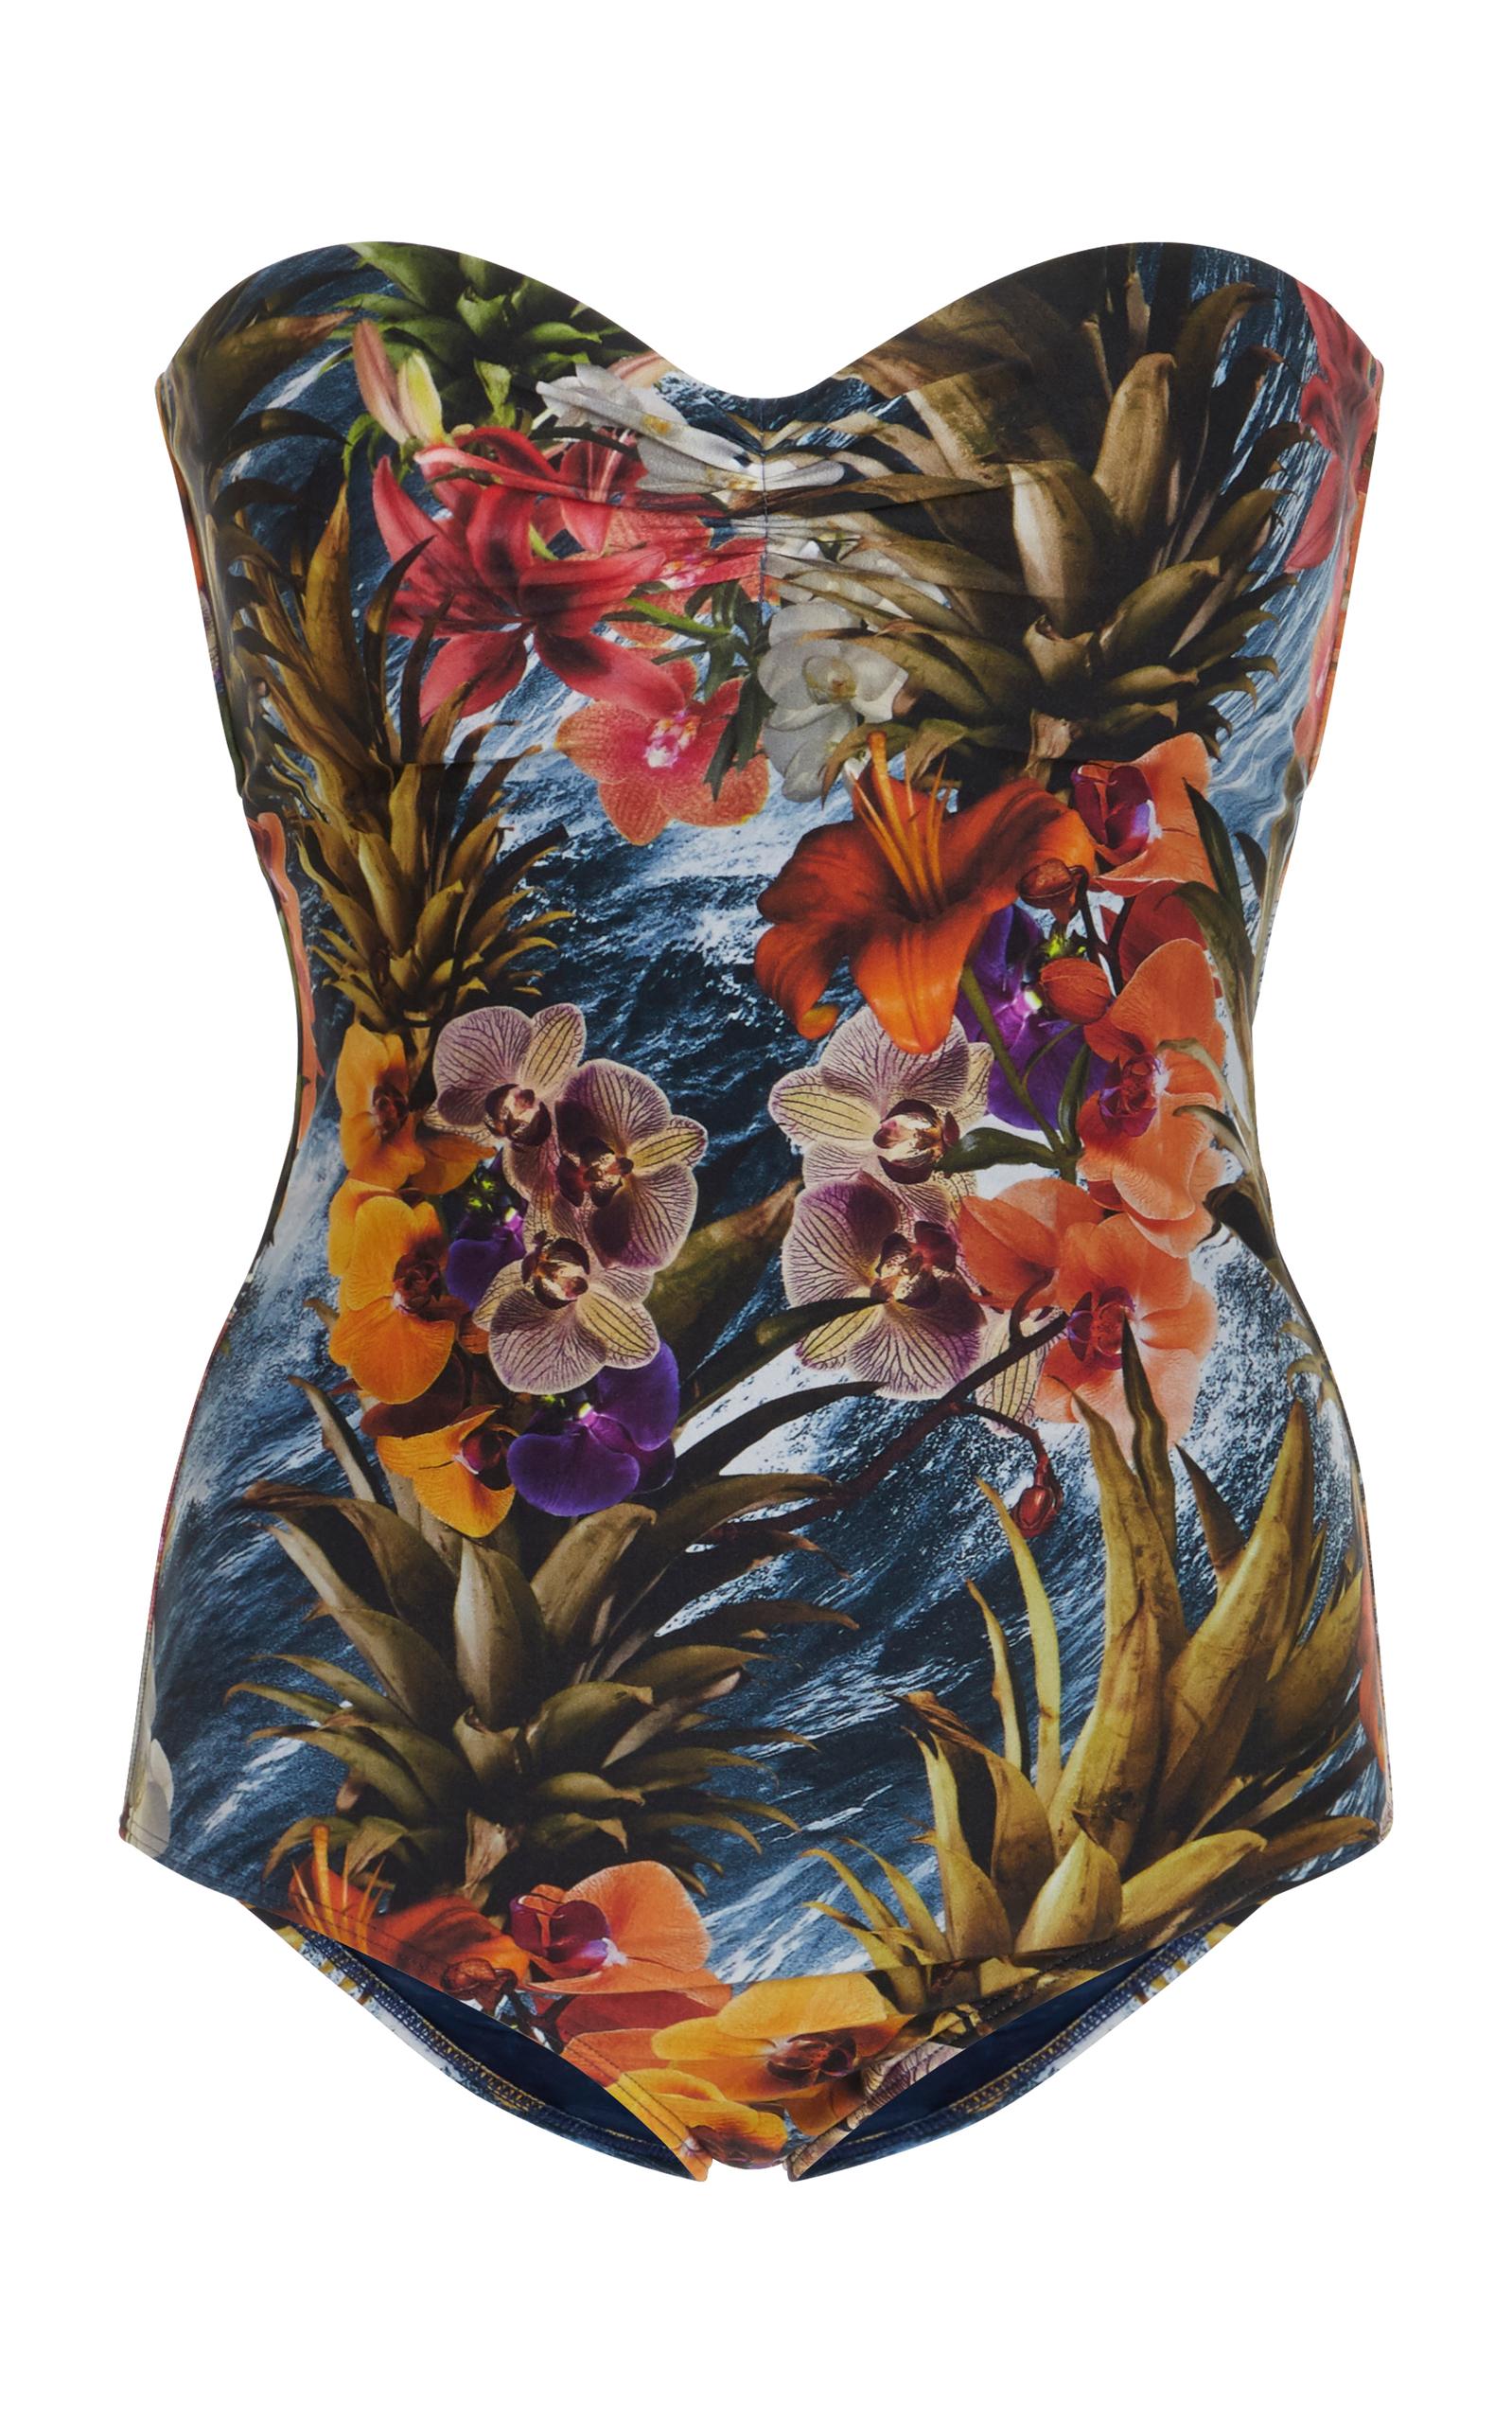 Jasmin Floral Long TunicÁgua de Coco heQ3nKymAH